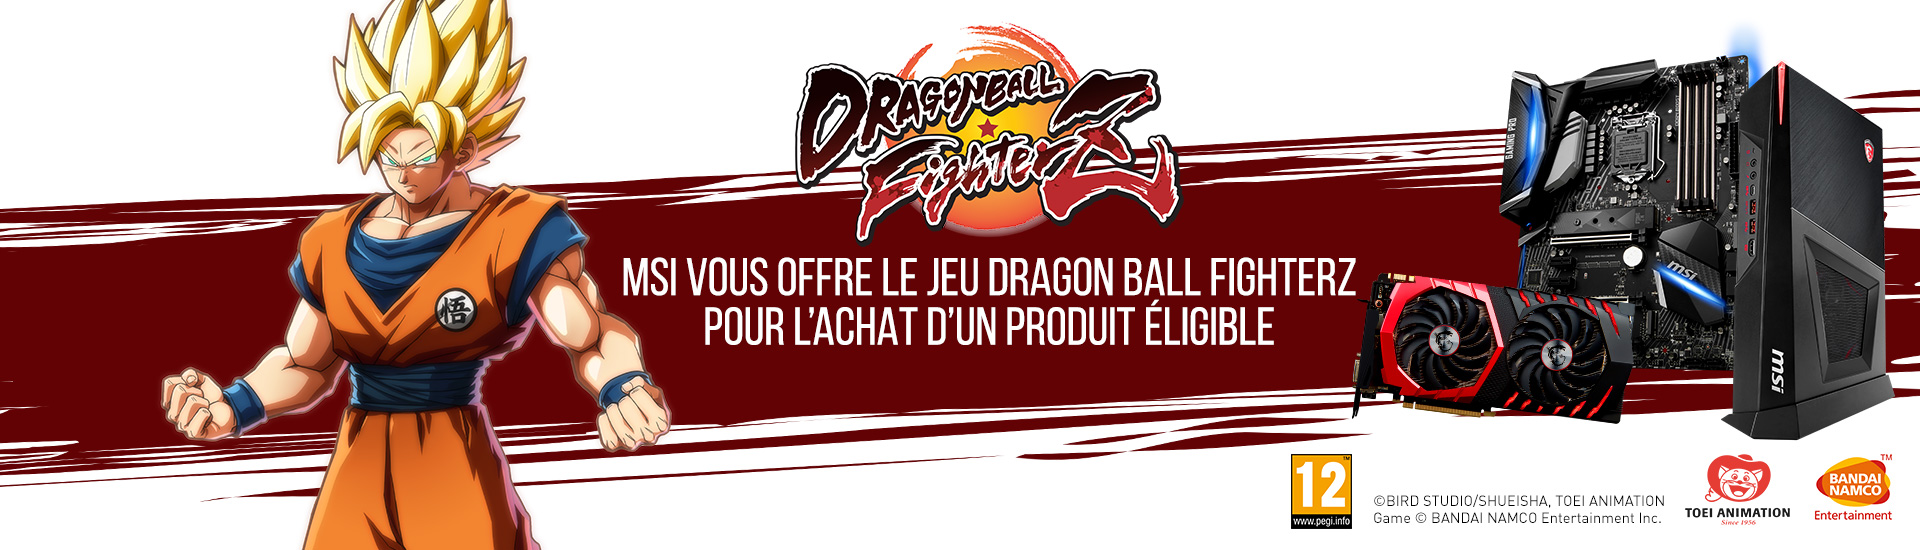 MSI vous offre le jeu Dragon Ball FighterZ